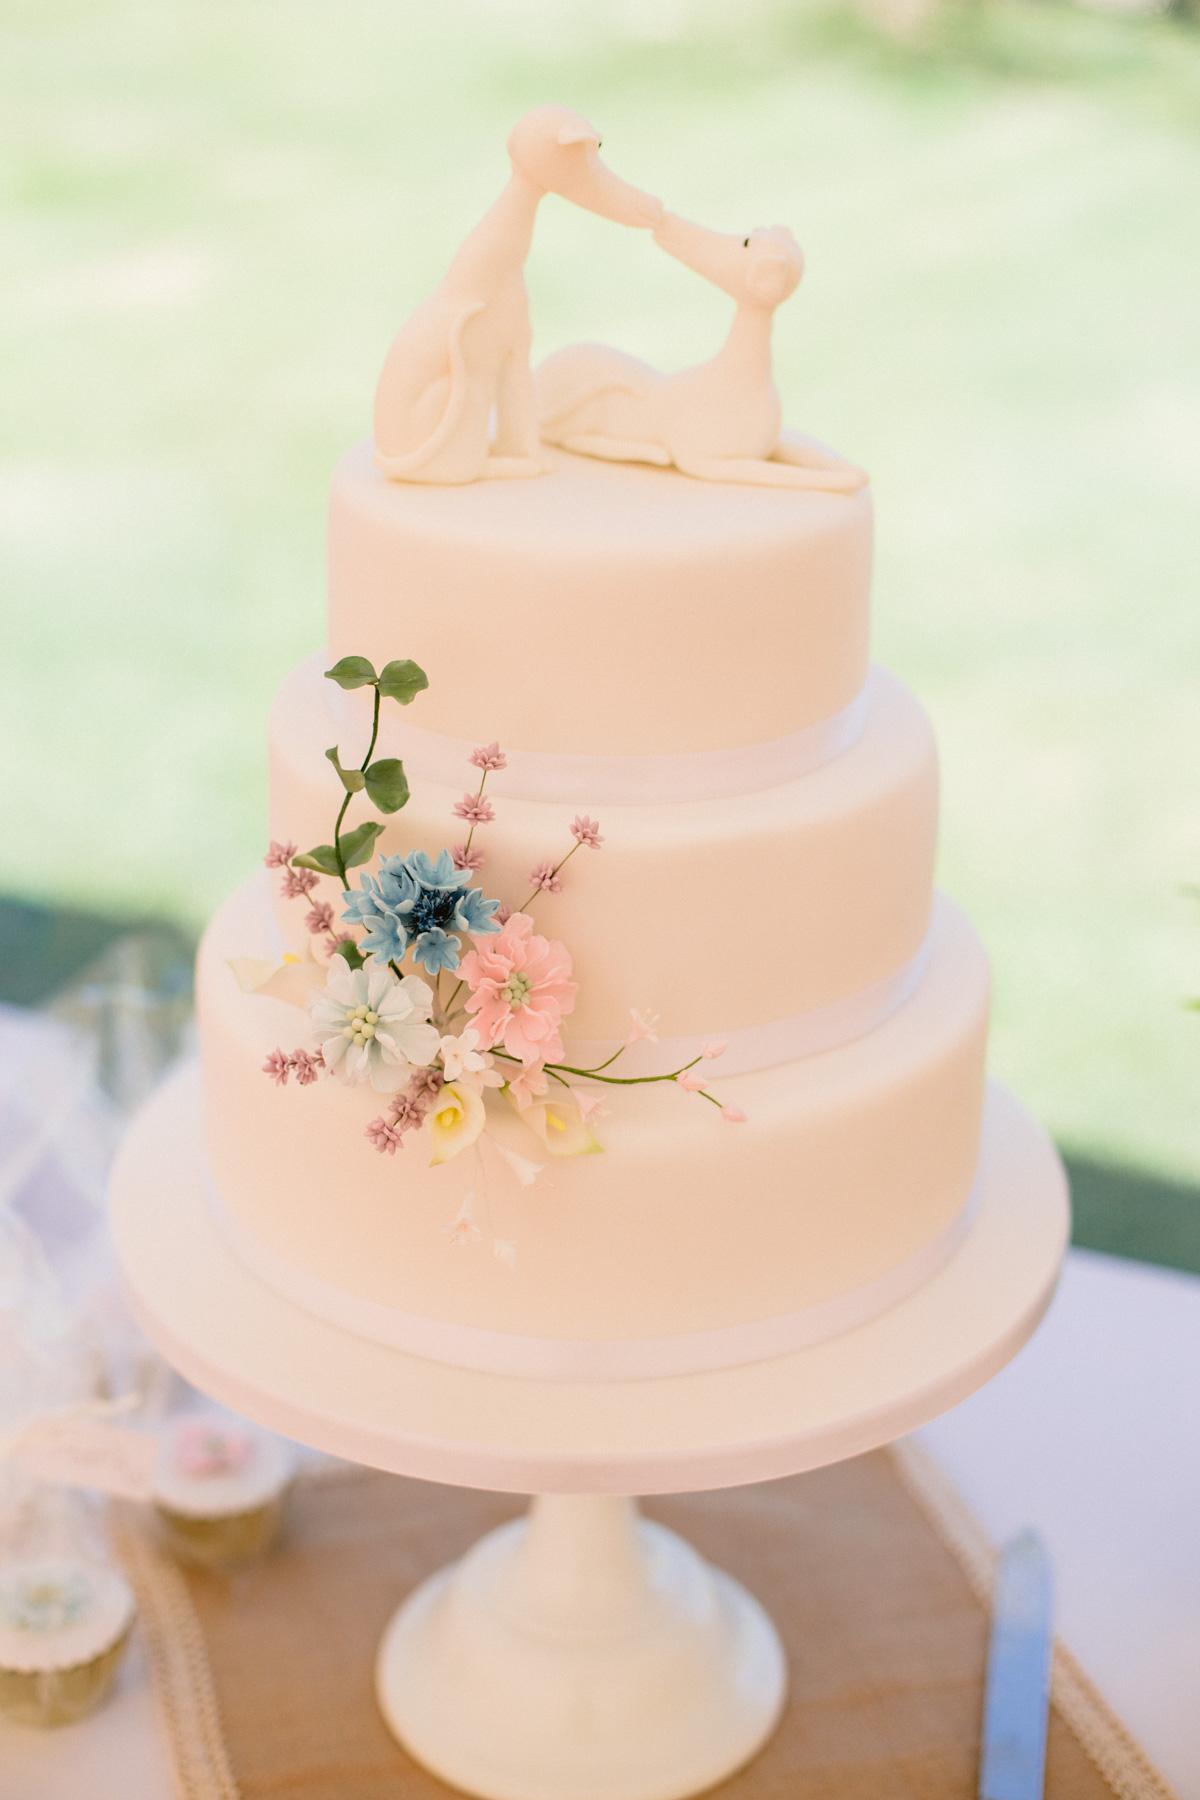 Dog Themed Wedding Cake | Marquee Wedding at Paxton House - Scottish Borders Wedding Photography